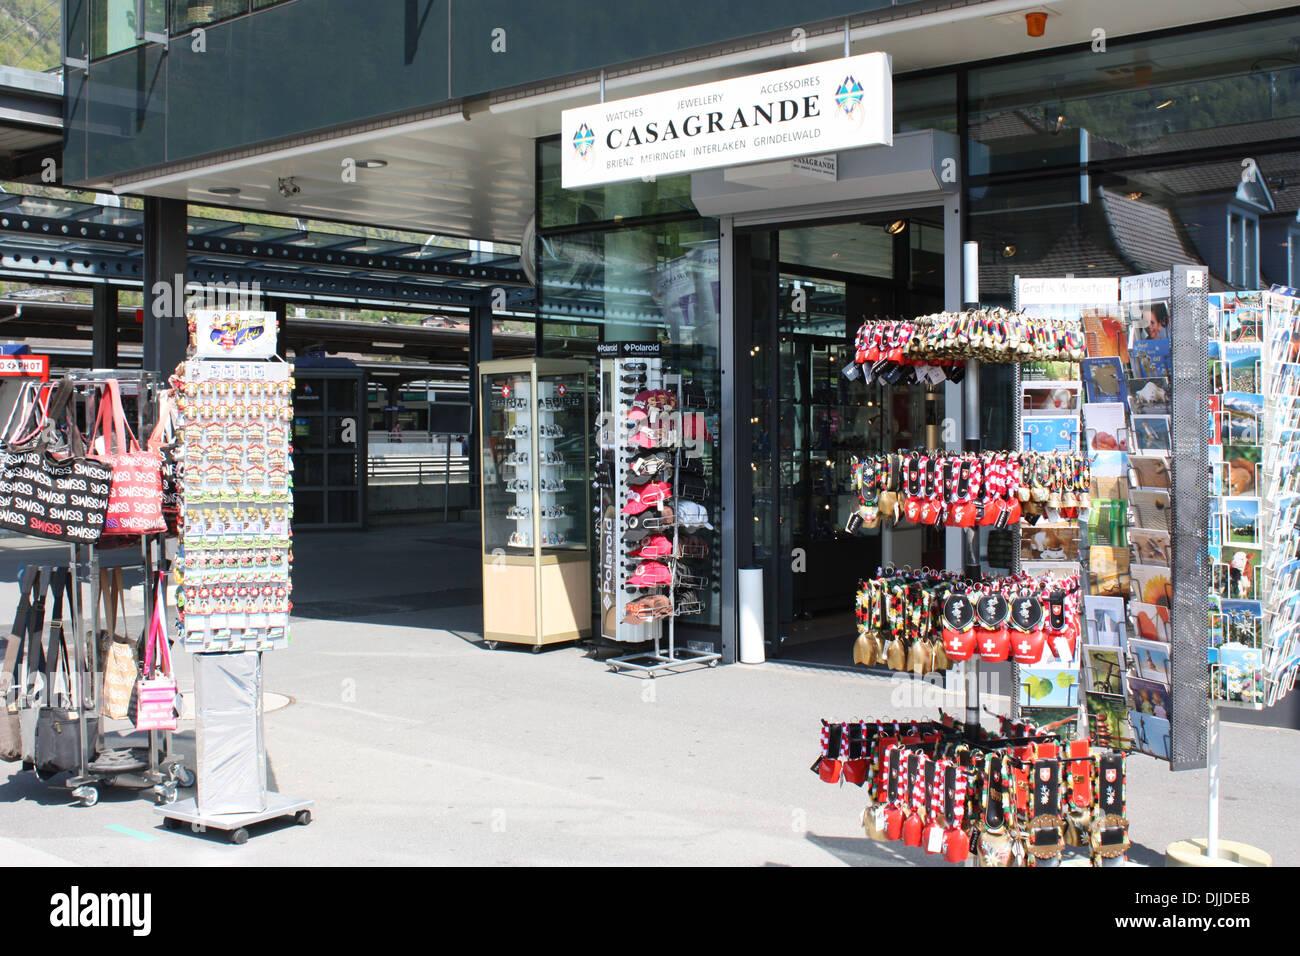 Sovereign gift shop display in Interlaken, Switzerland Stock Photo